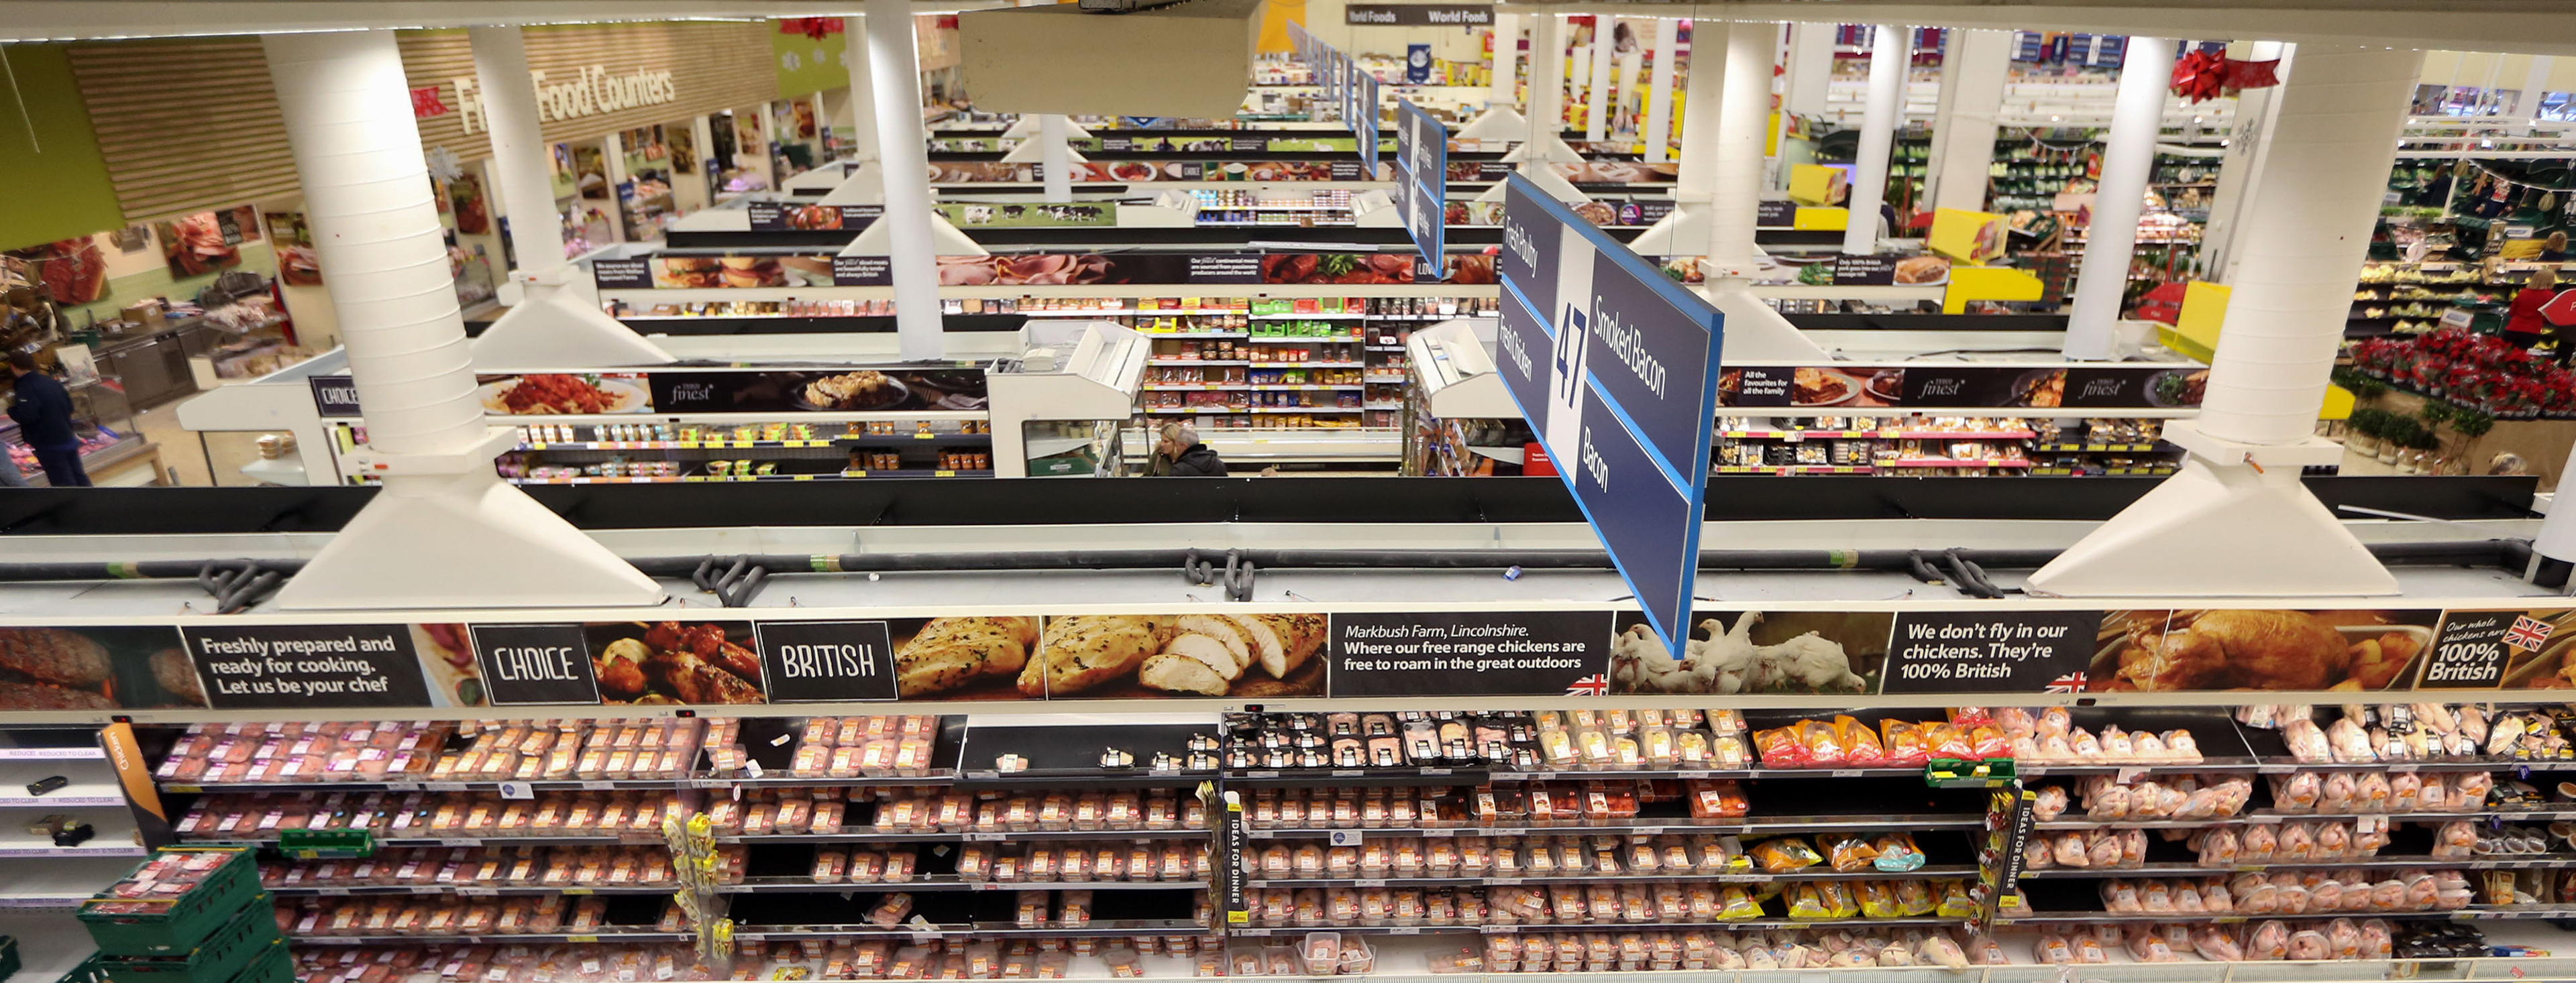 Inside A Tesco Plc Supermarket As Shoppers Prepare For Christmas